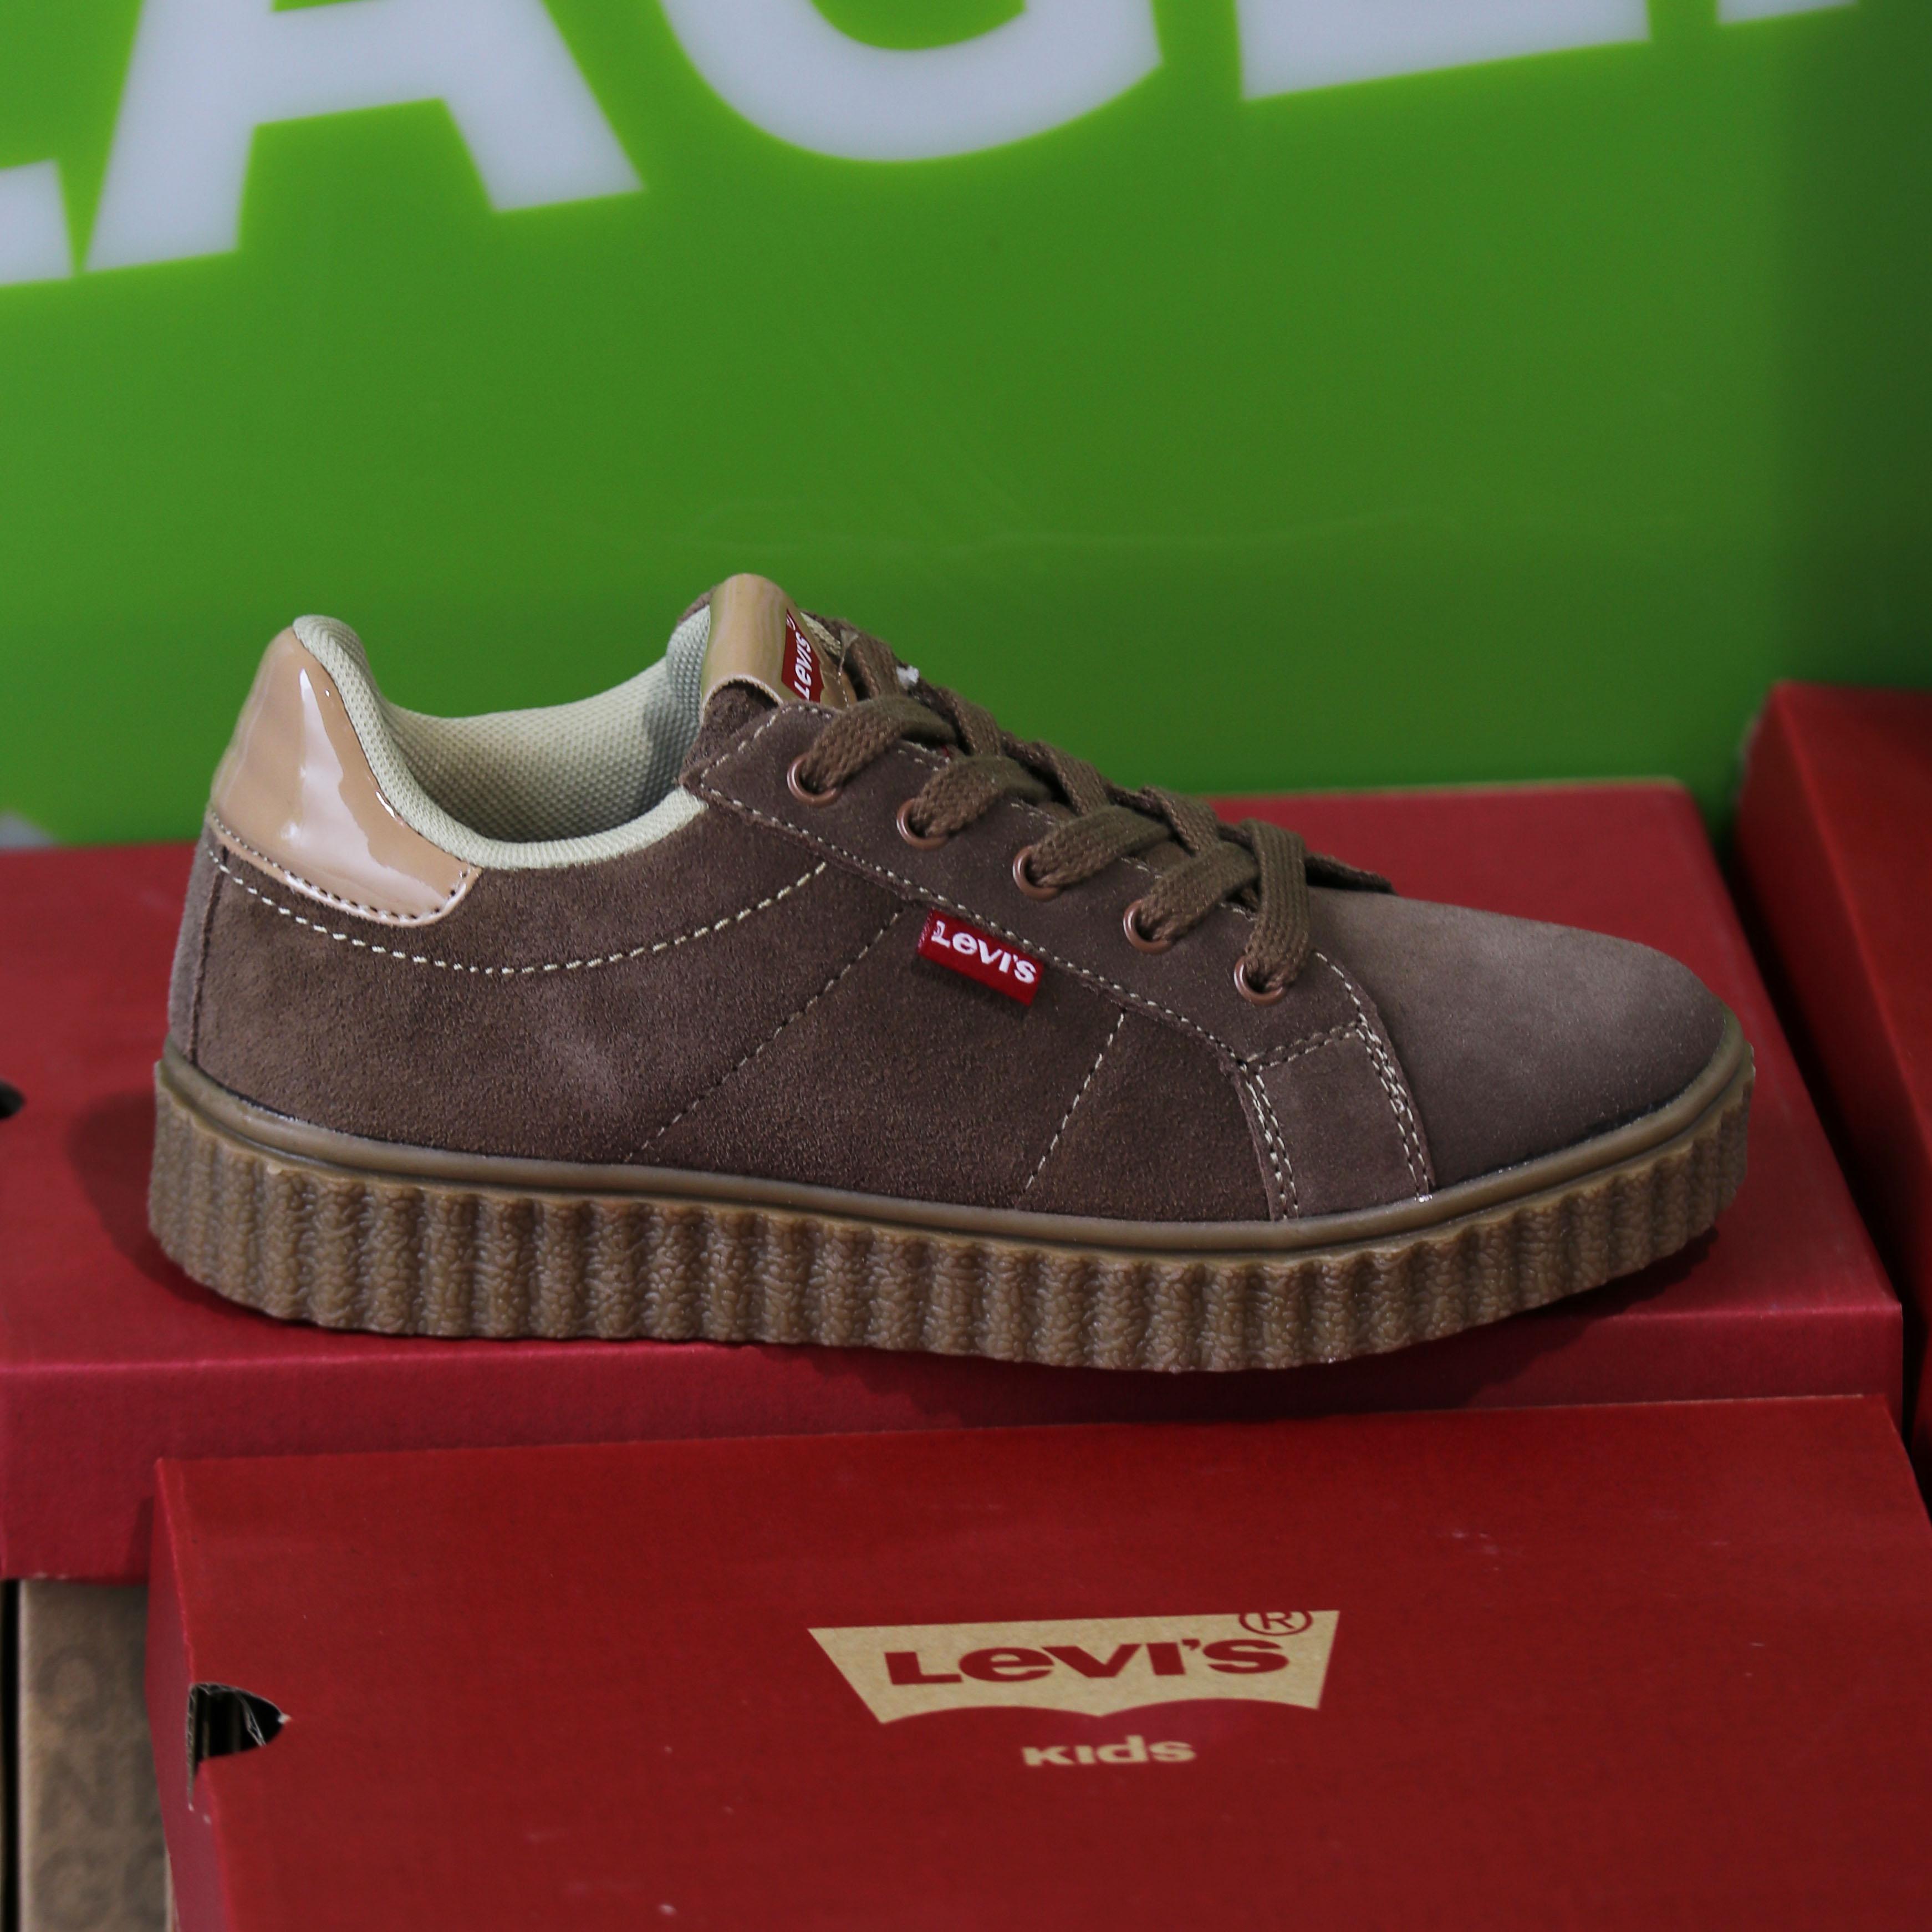 levis kids – new england brun sko barn dame sneakers1